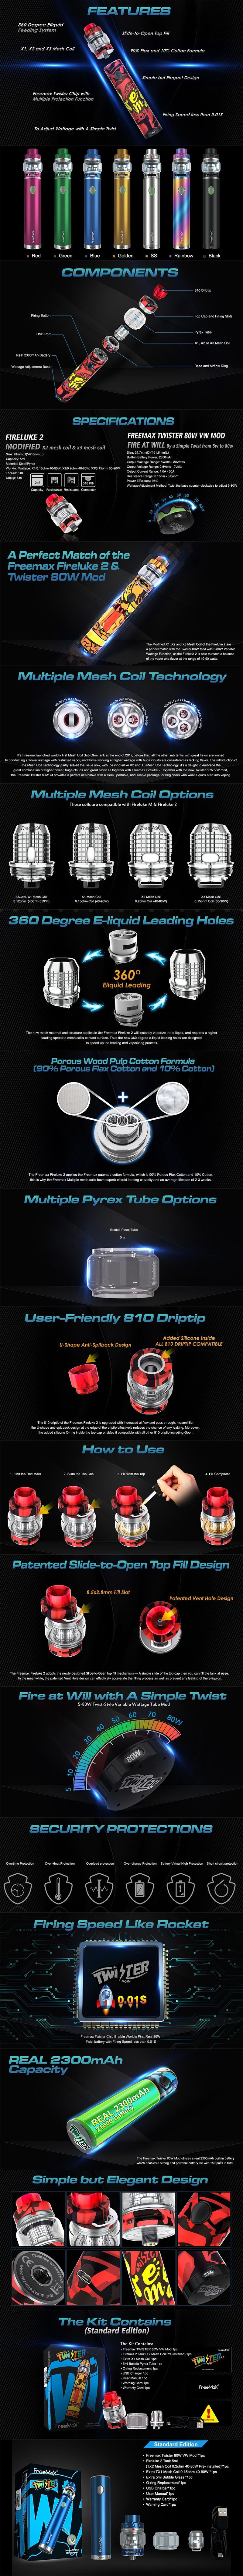 FreeMax Twister 80W 2300mAh VW Battery w/ Fireluke 2 Tank Starter Kit